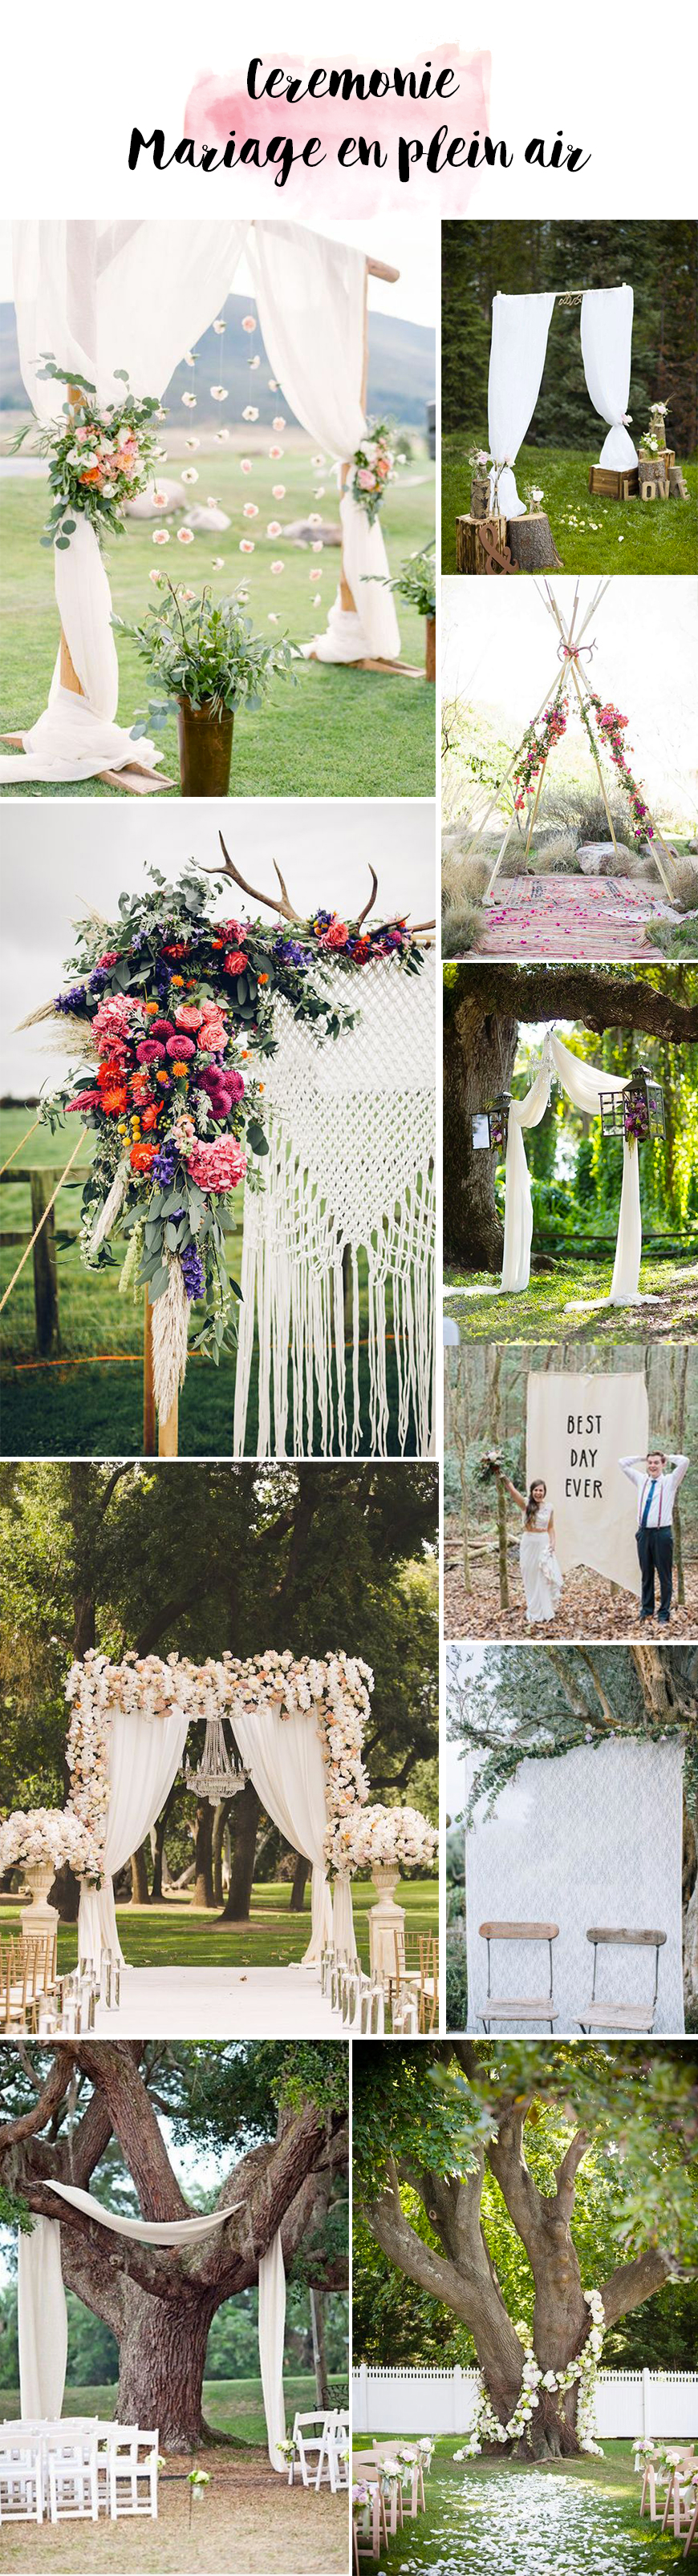 arche-ceremonie-mariage-plein-air-madmeoiselle-claudine-